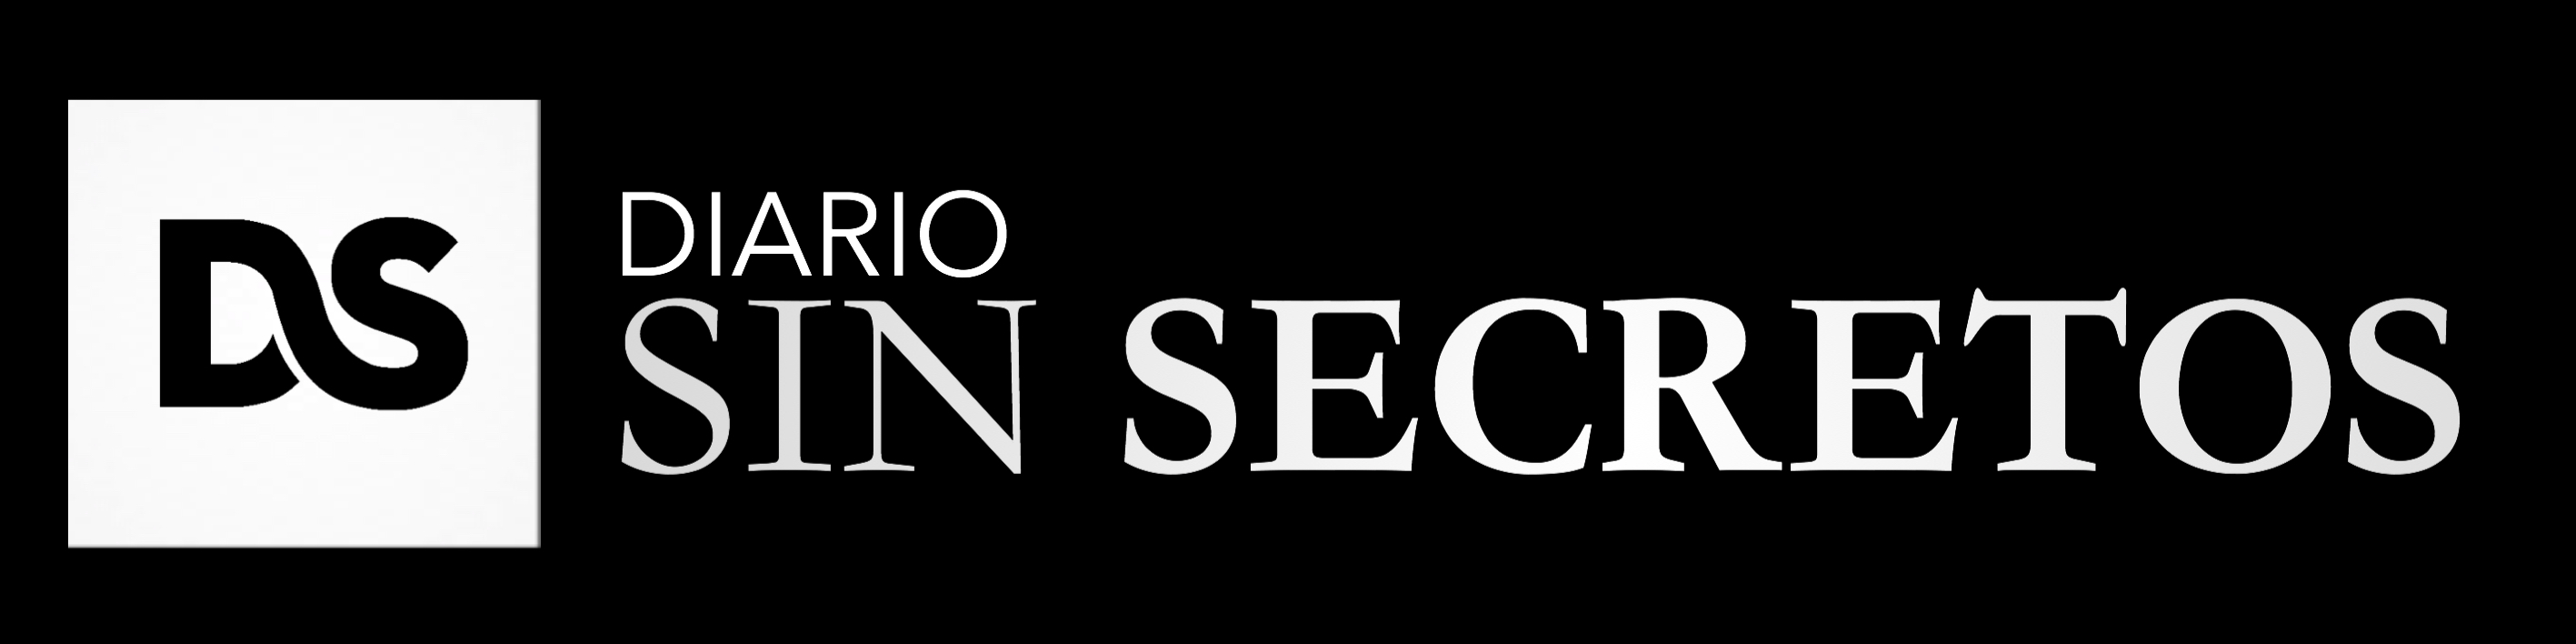 Diario Sin Secretos